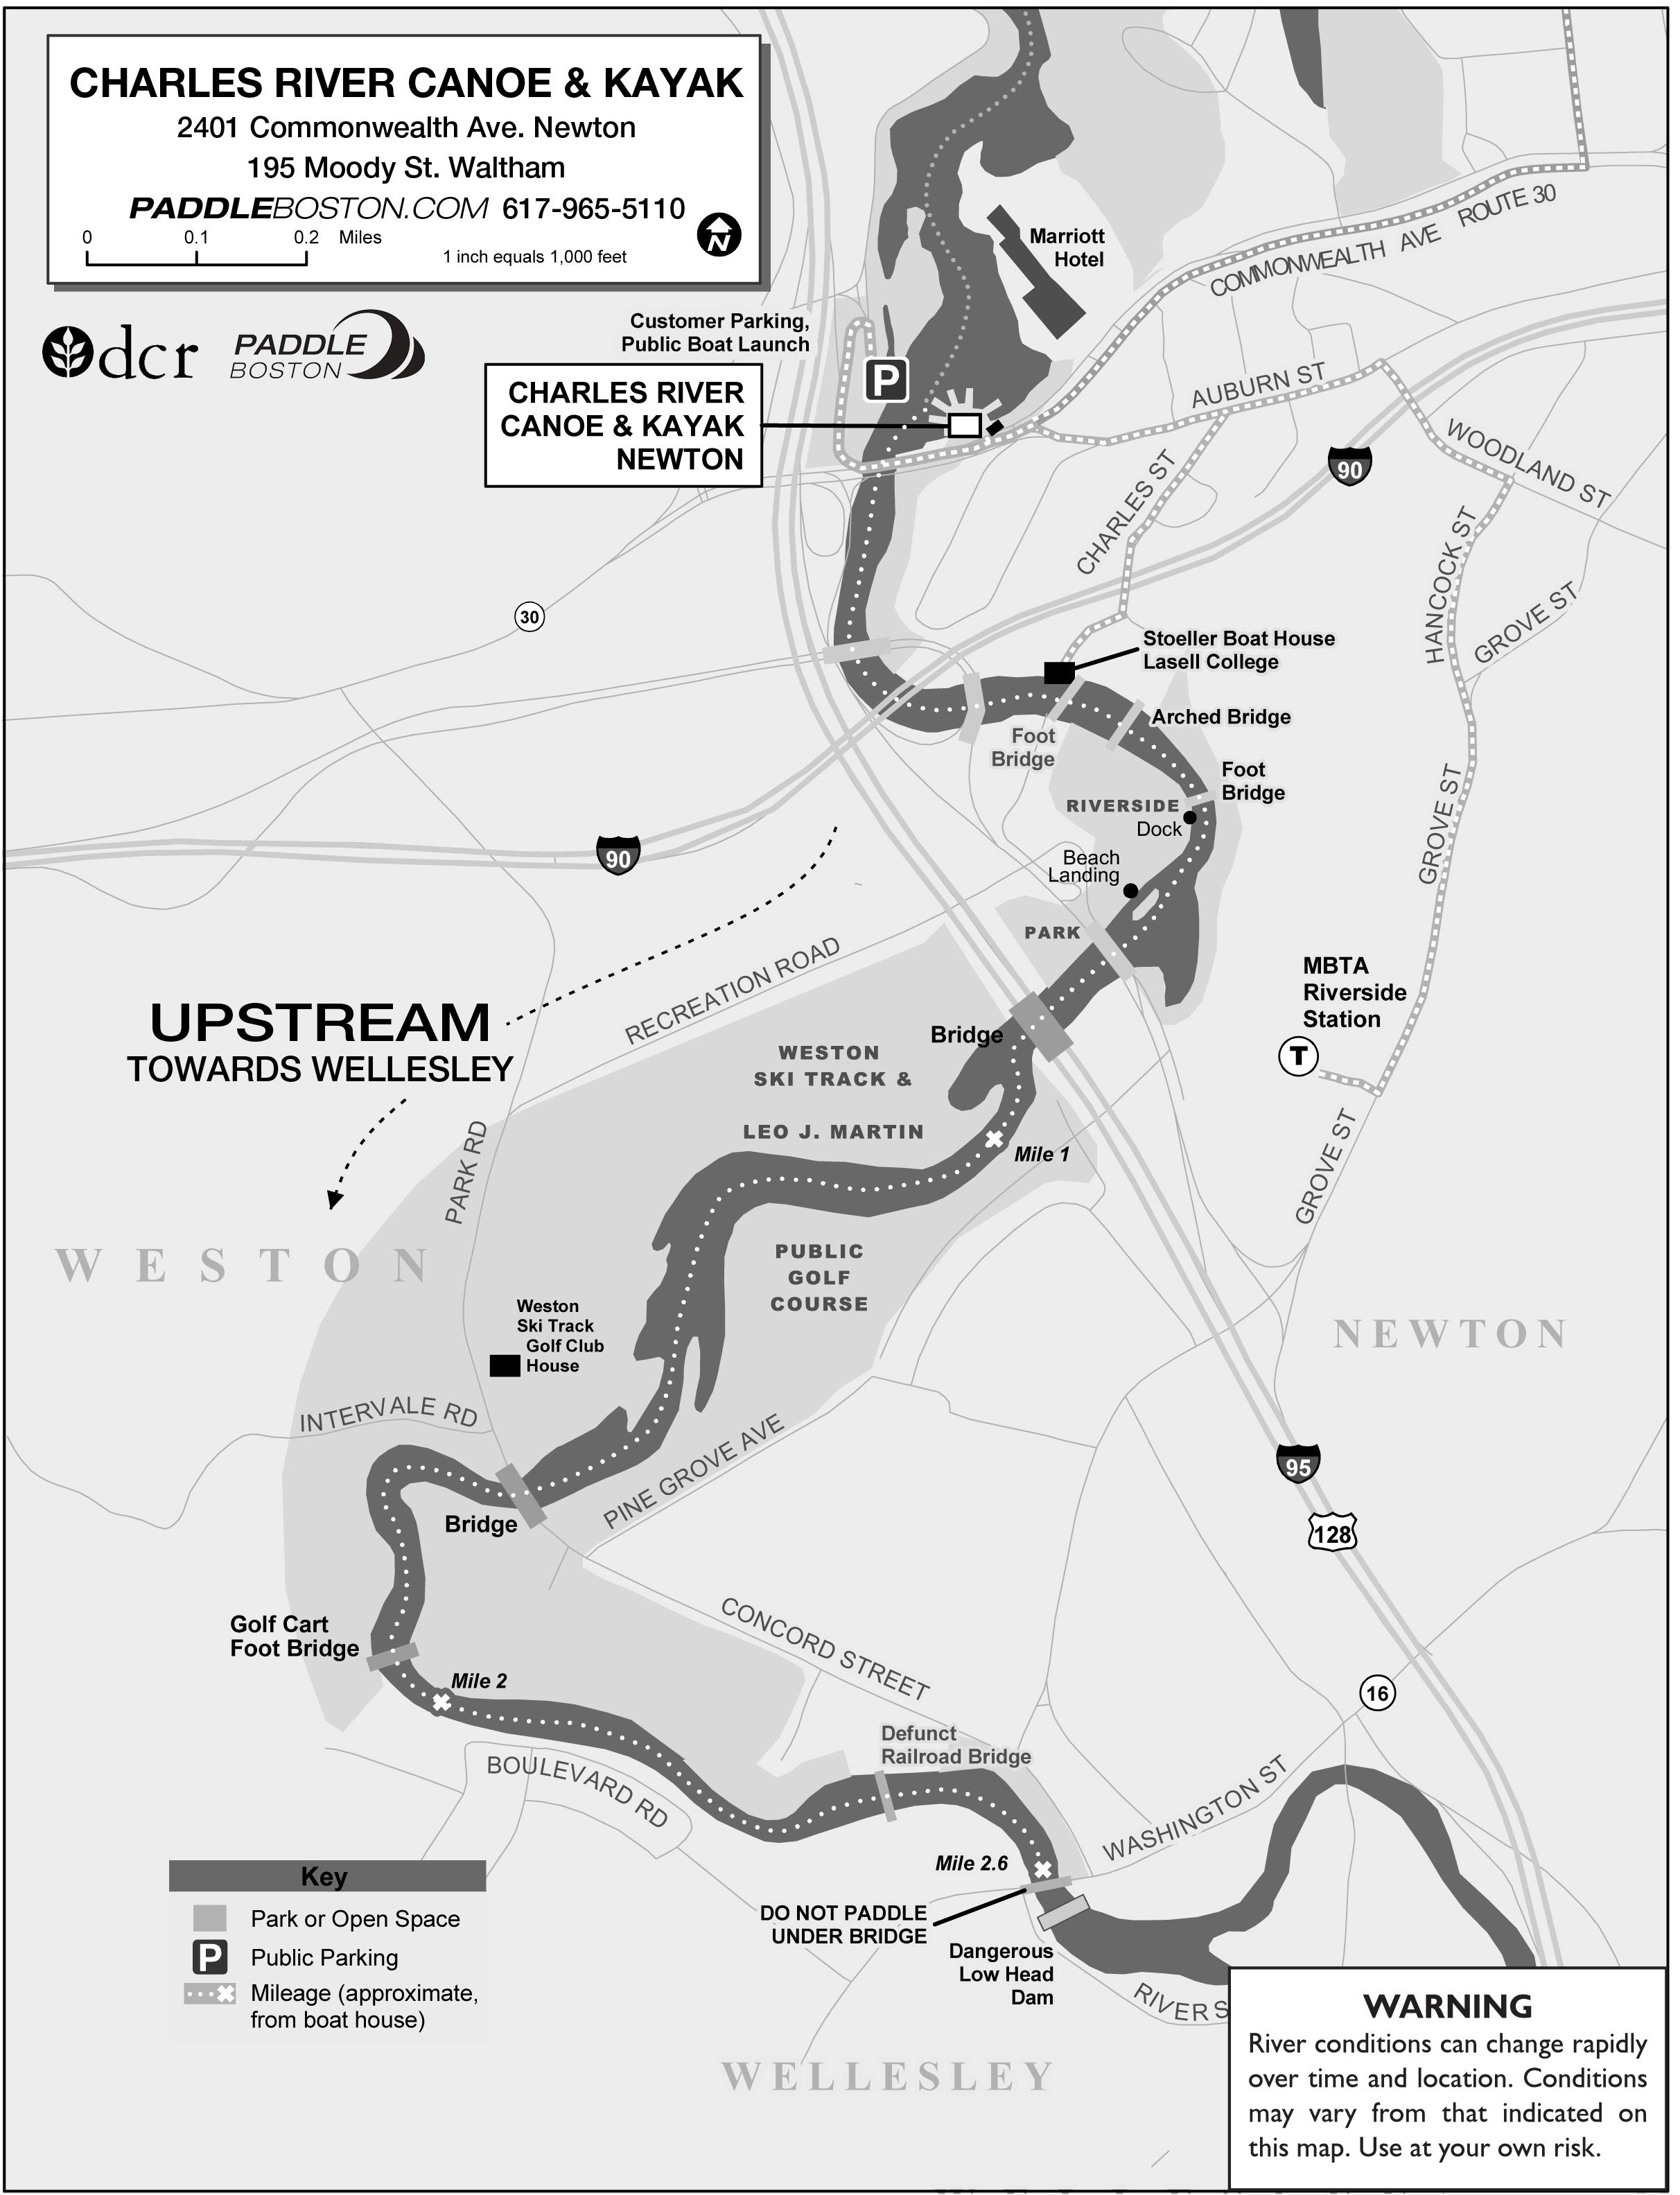 2015walthampaddlingmap1